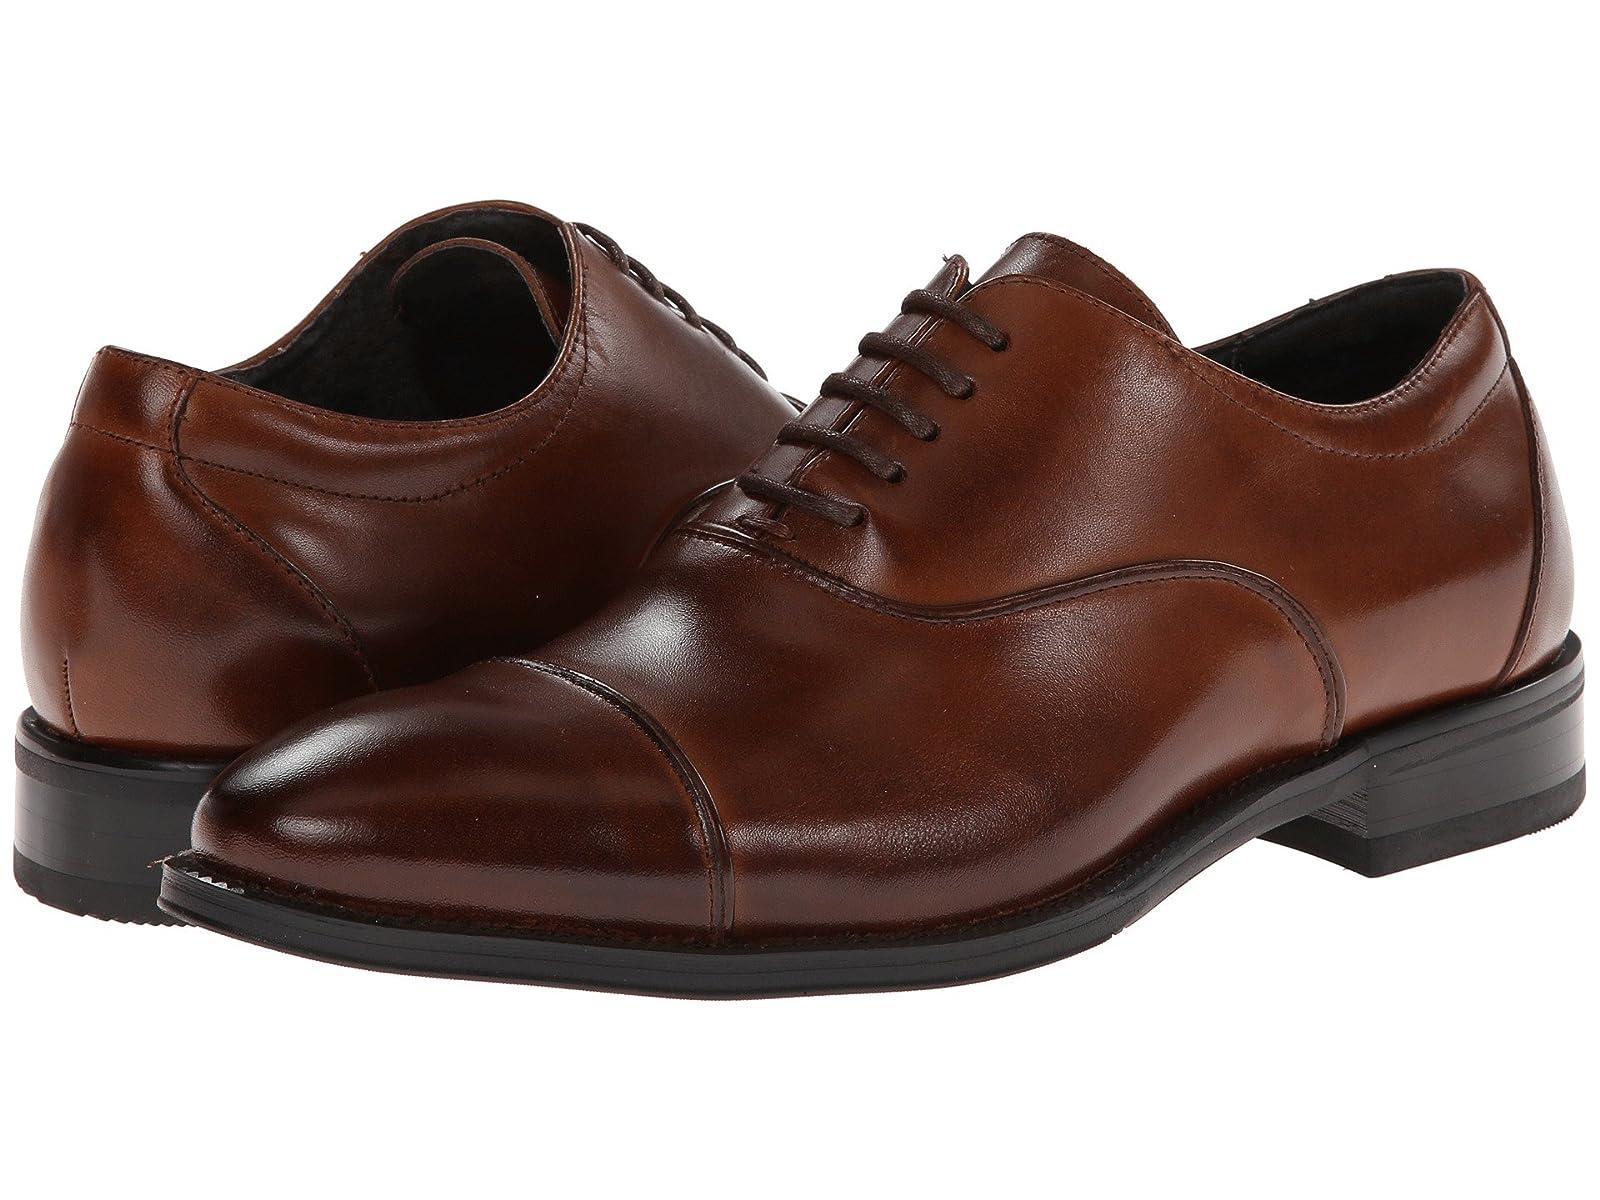 Stacy Adams KordellAtmospheric grades have affordable shoes